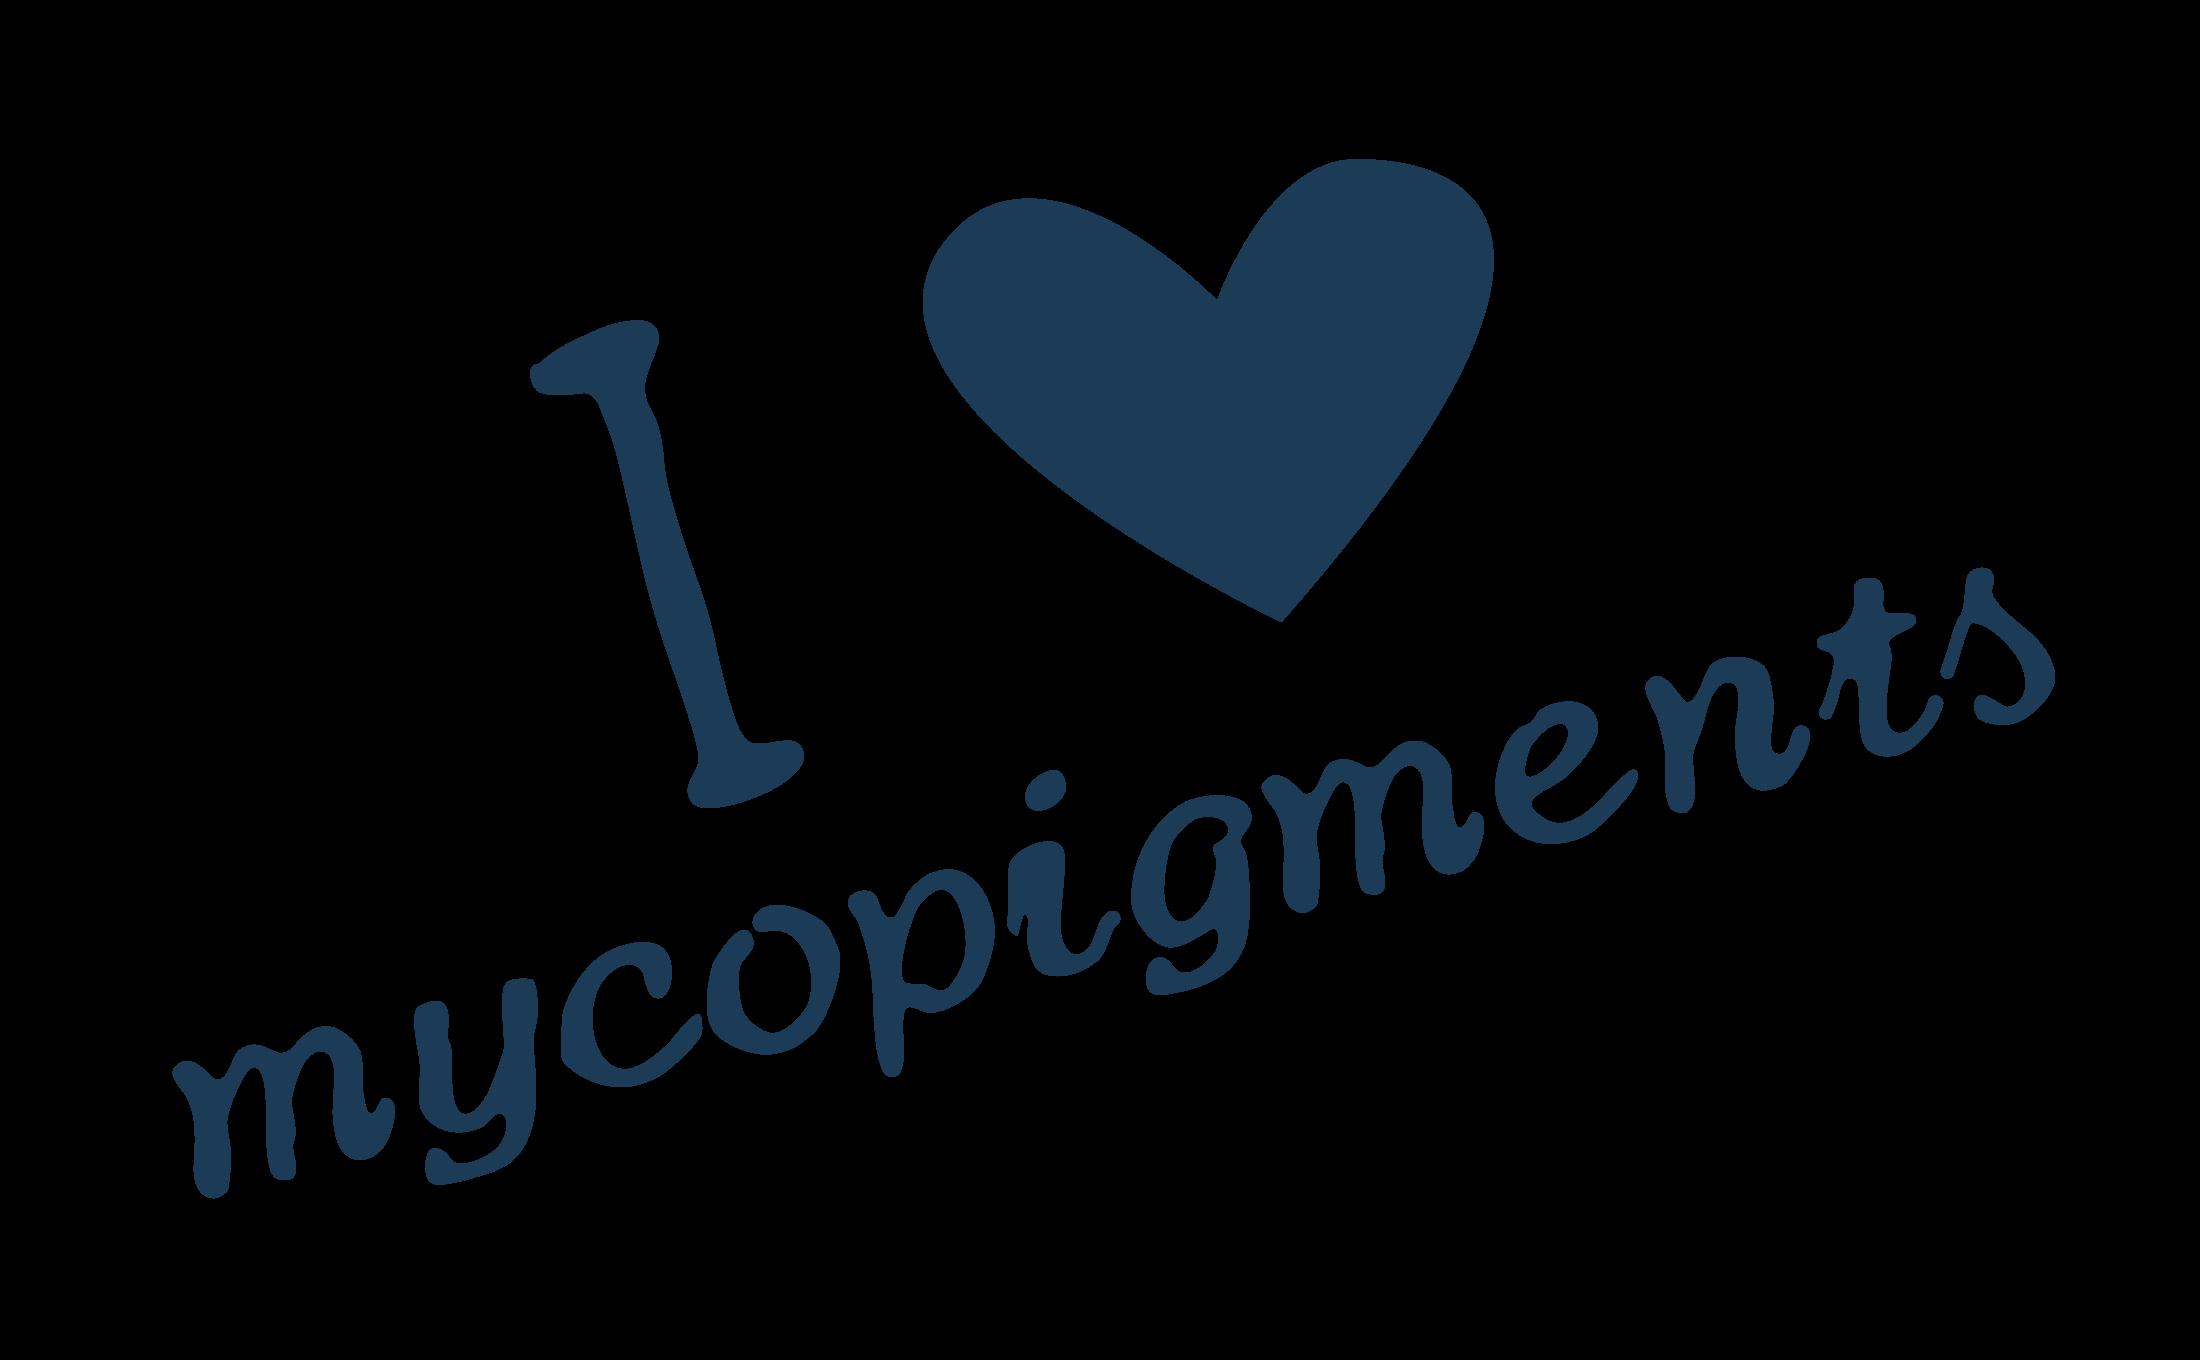 mycopigments t-shirt artwork 5-4-03